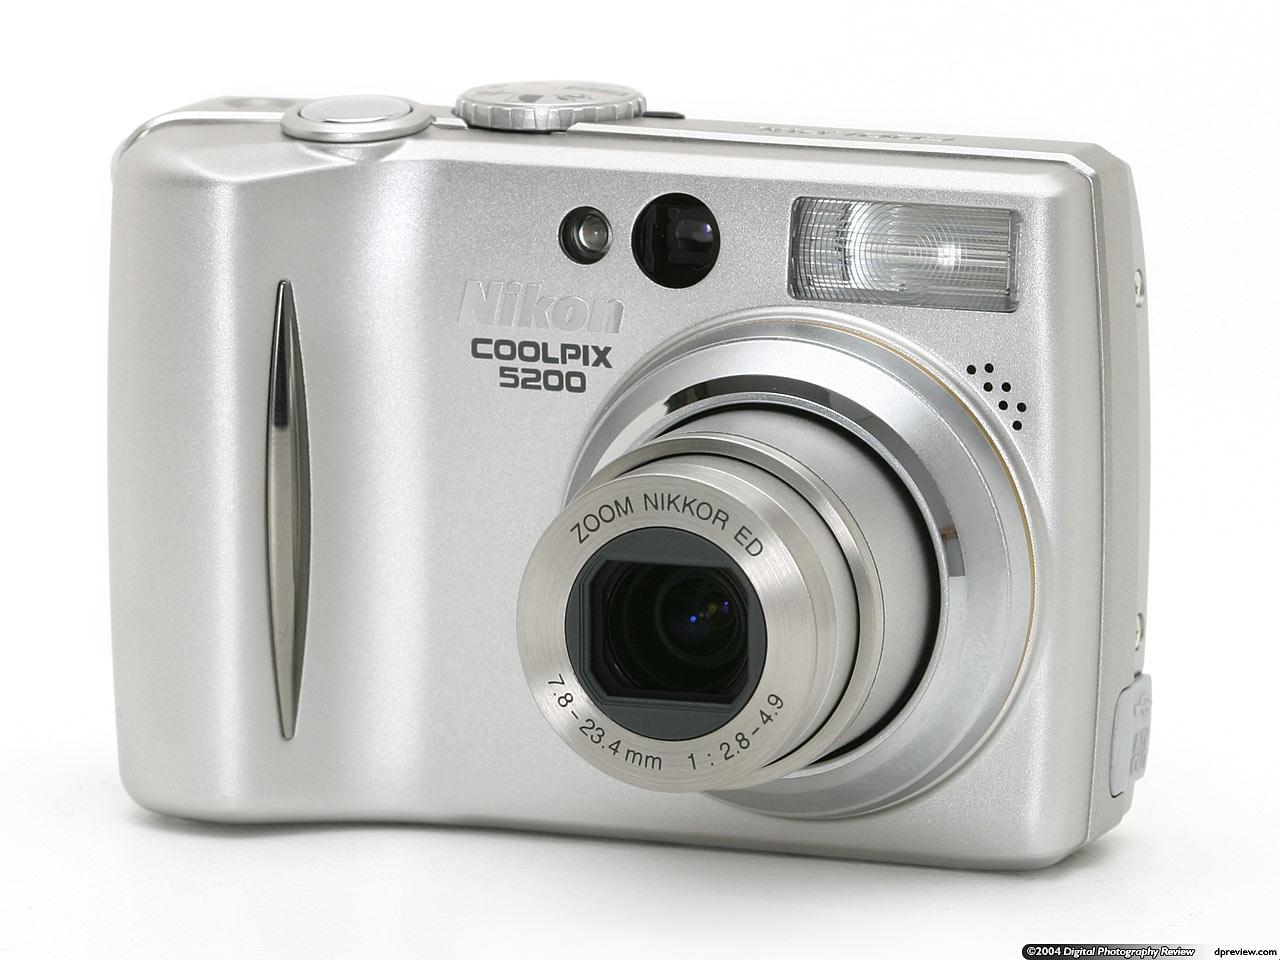 nikon coolpix 5200 review digital photography review rh dpreview com nikon coolpix 4800 manual nikon coolpix s4200 mode d'emploi